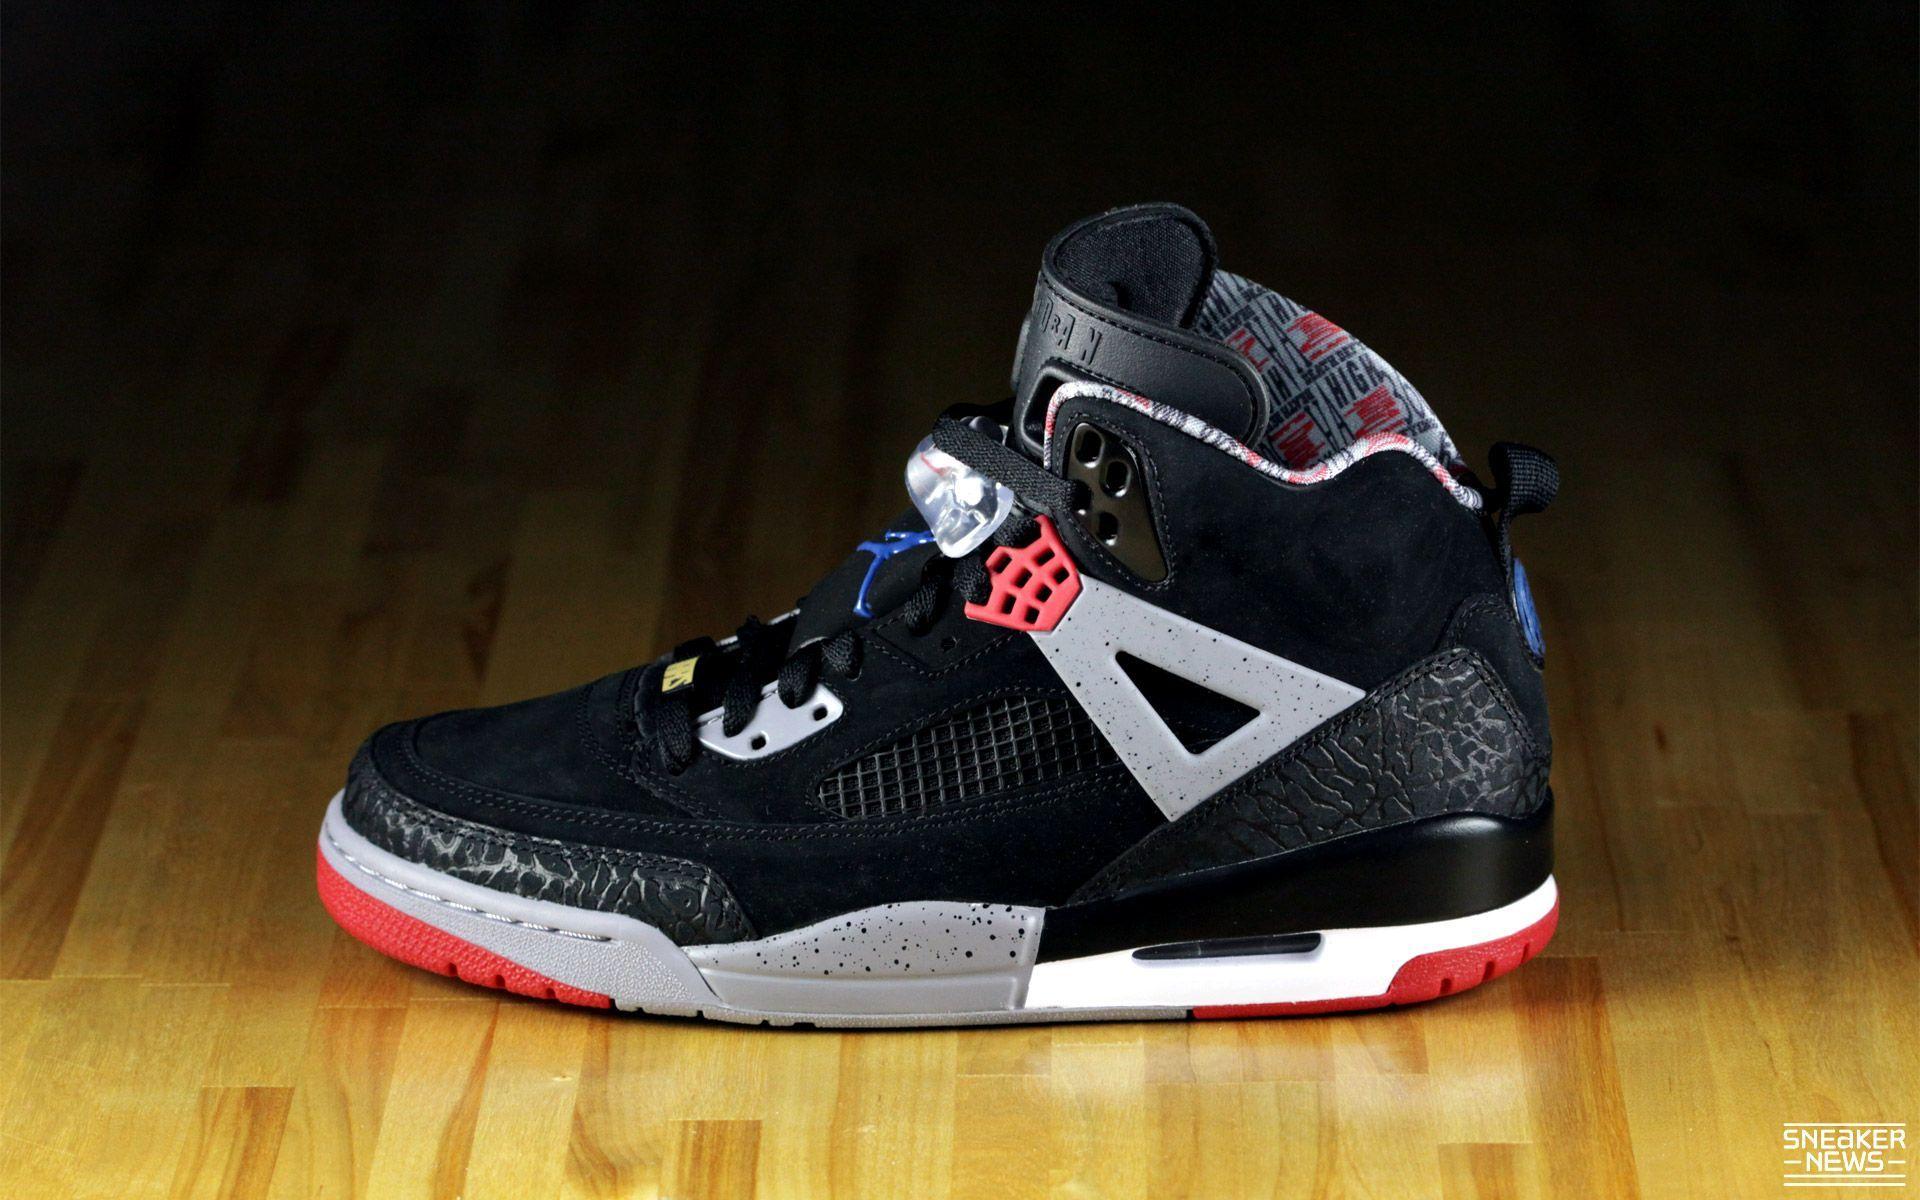 air jordan shoes hd wallpaper